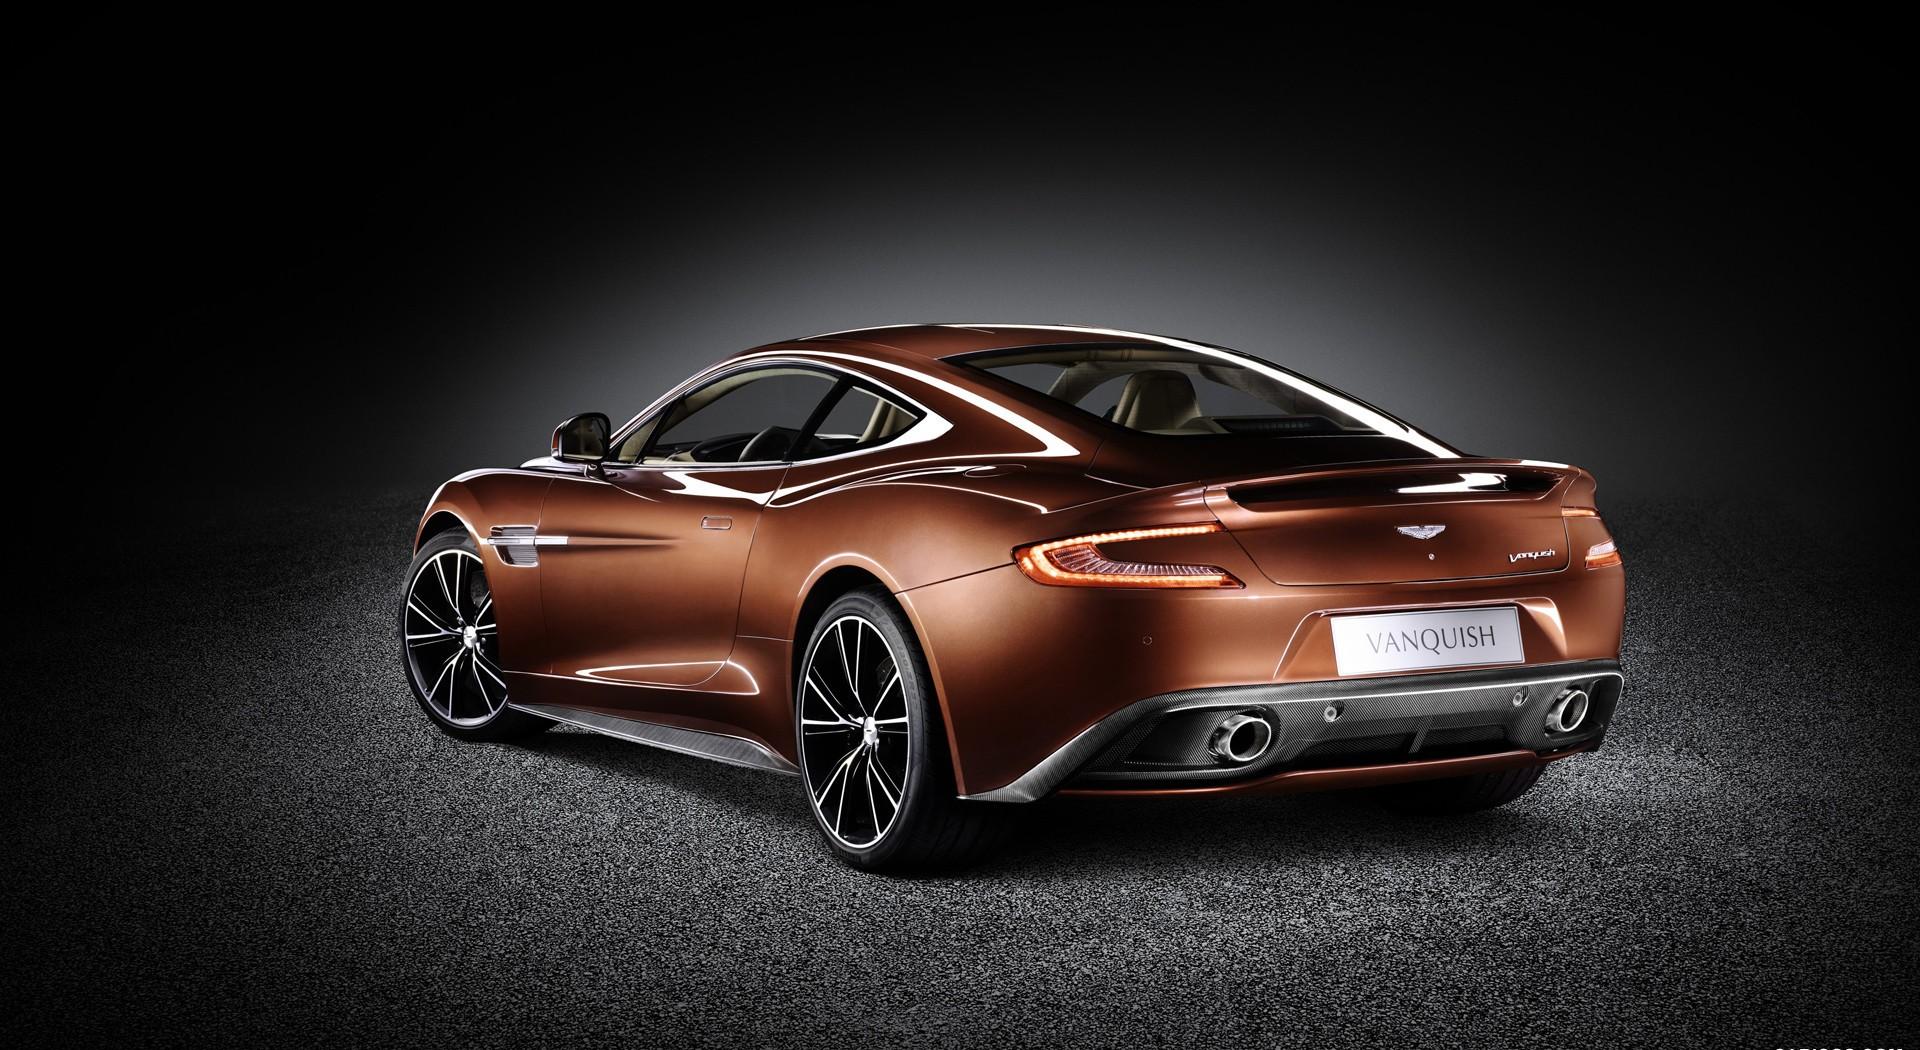 Aston Martin Vanquish pictures A2